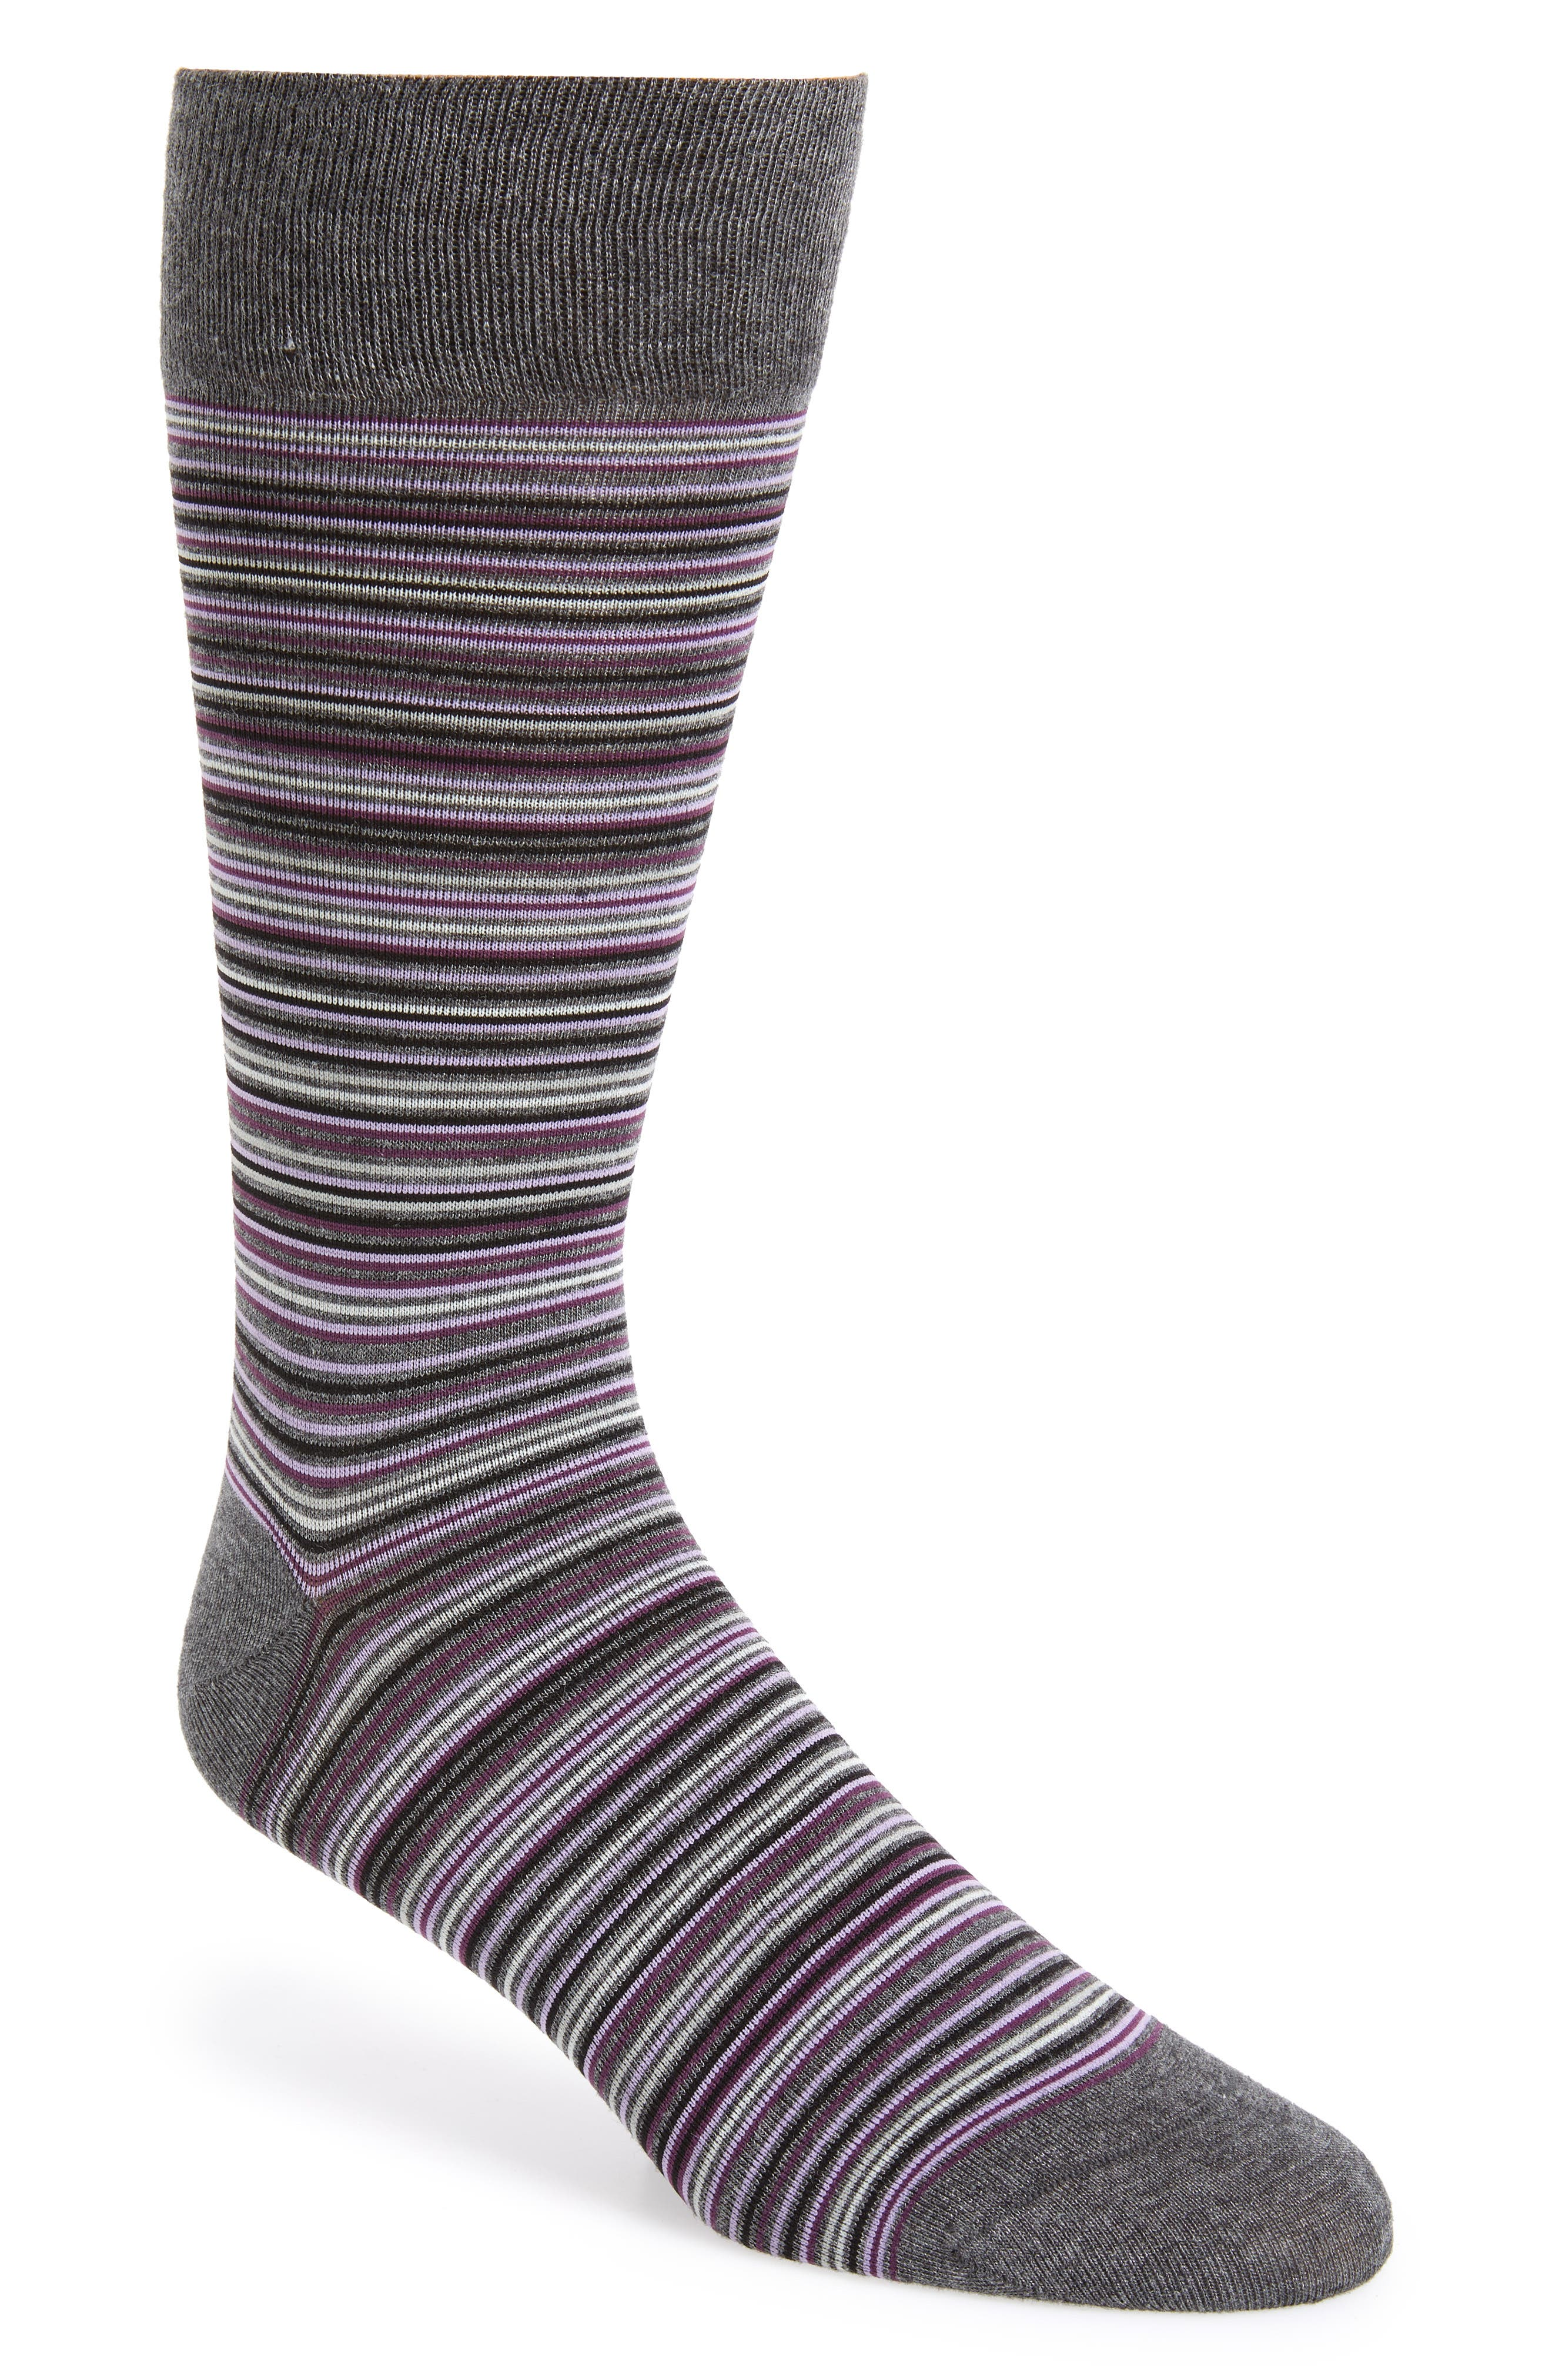 Multistripe Crew Socks,                         Main,                         color, CHARCOAL HEATHER/ PURPLE